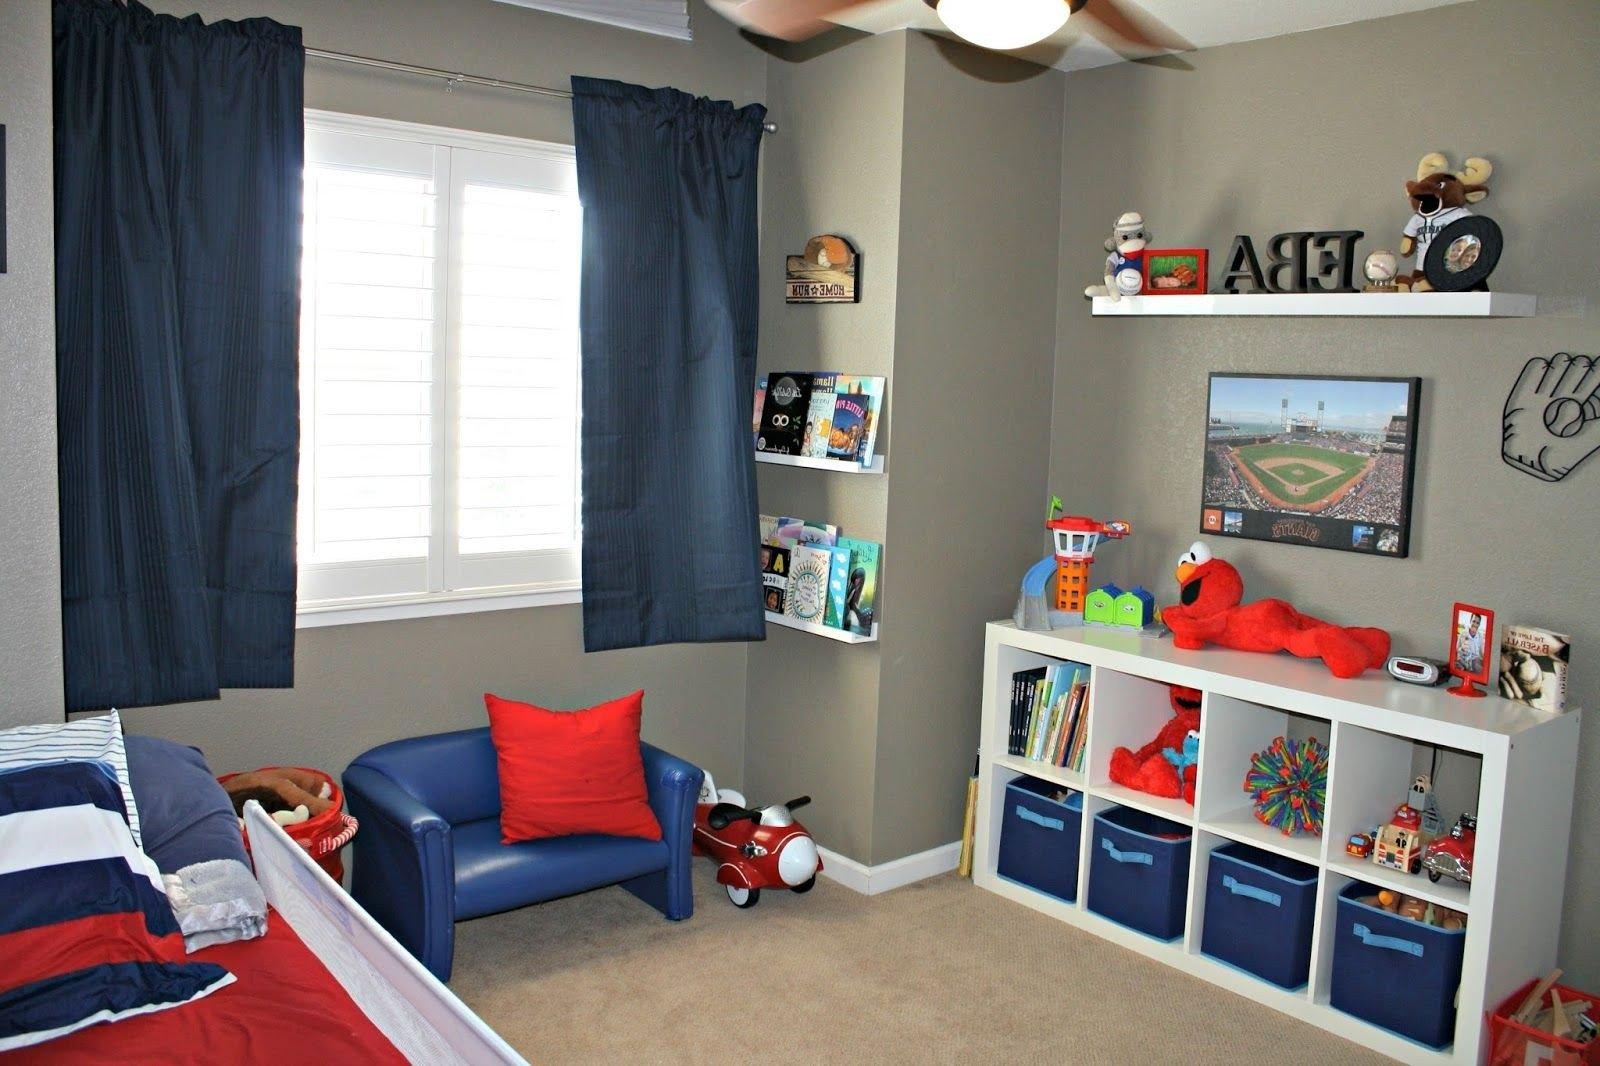 Little Boy Room Decor Ideas Lovely Boy Bedroom Ideas Visi Build 3d Home Decor In 2019